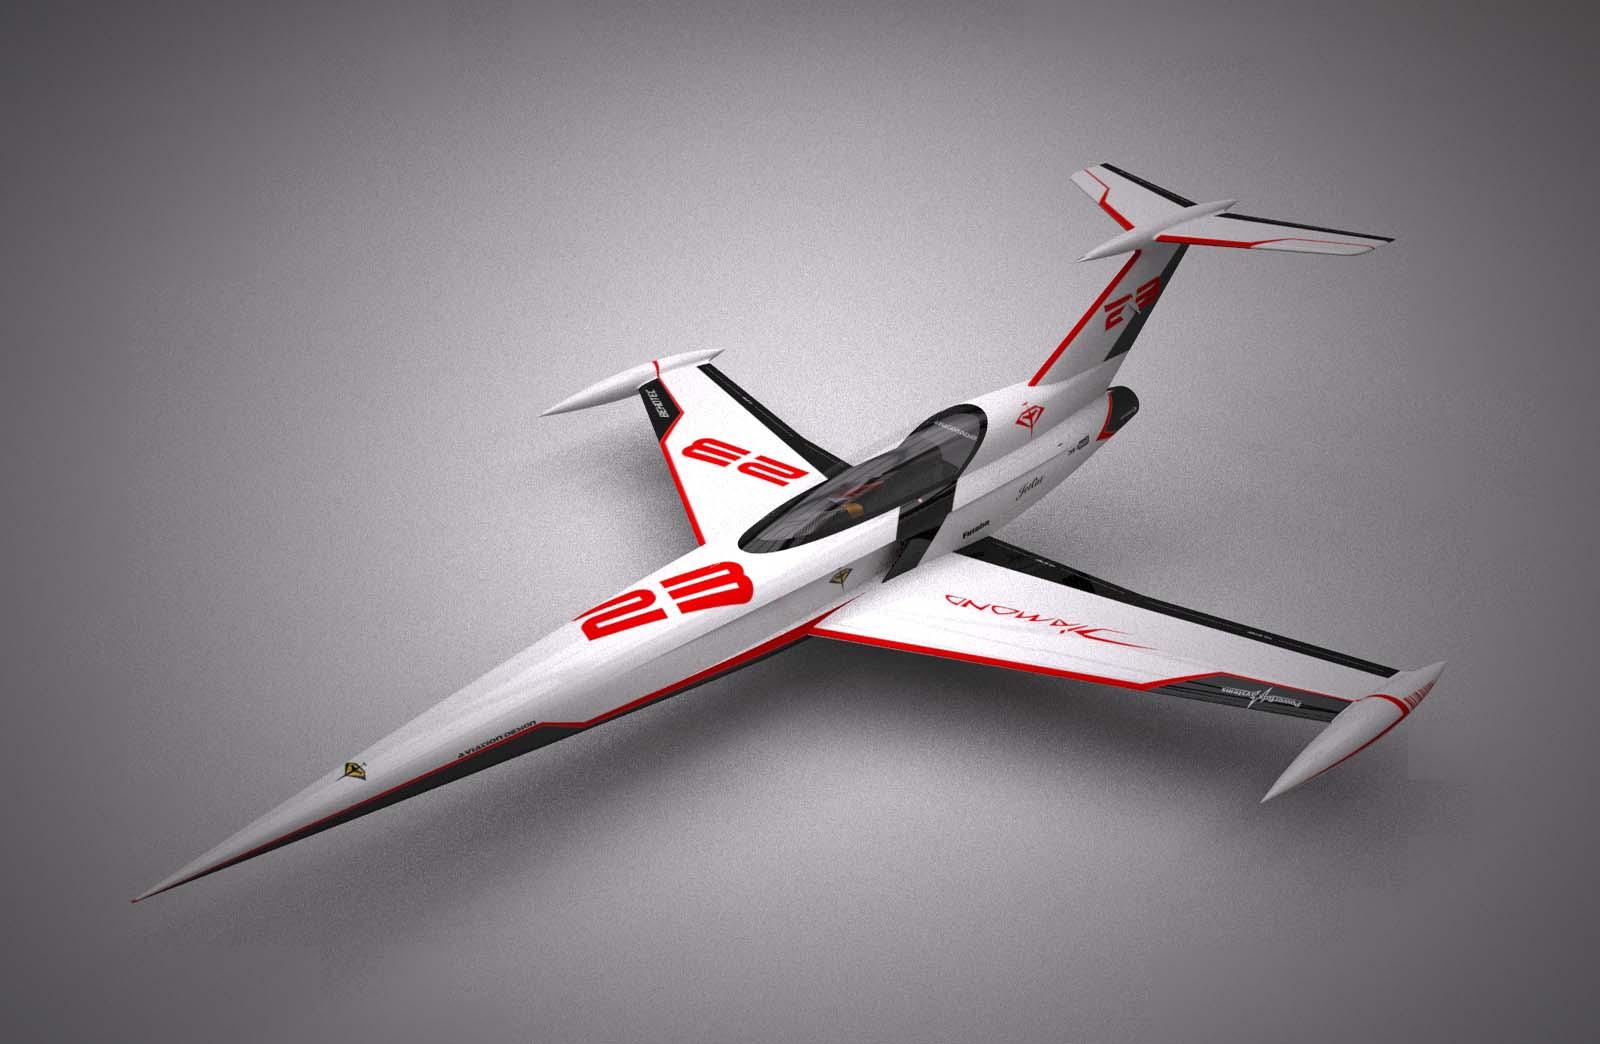 RC Jet Model DIAMOND - Kit designed by Eric Rantet